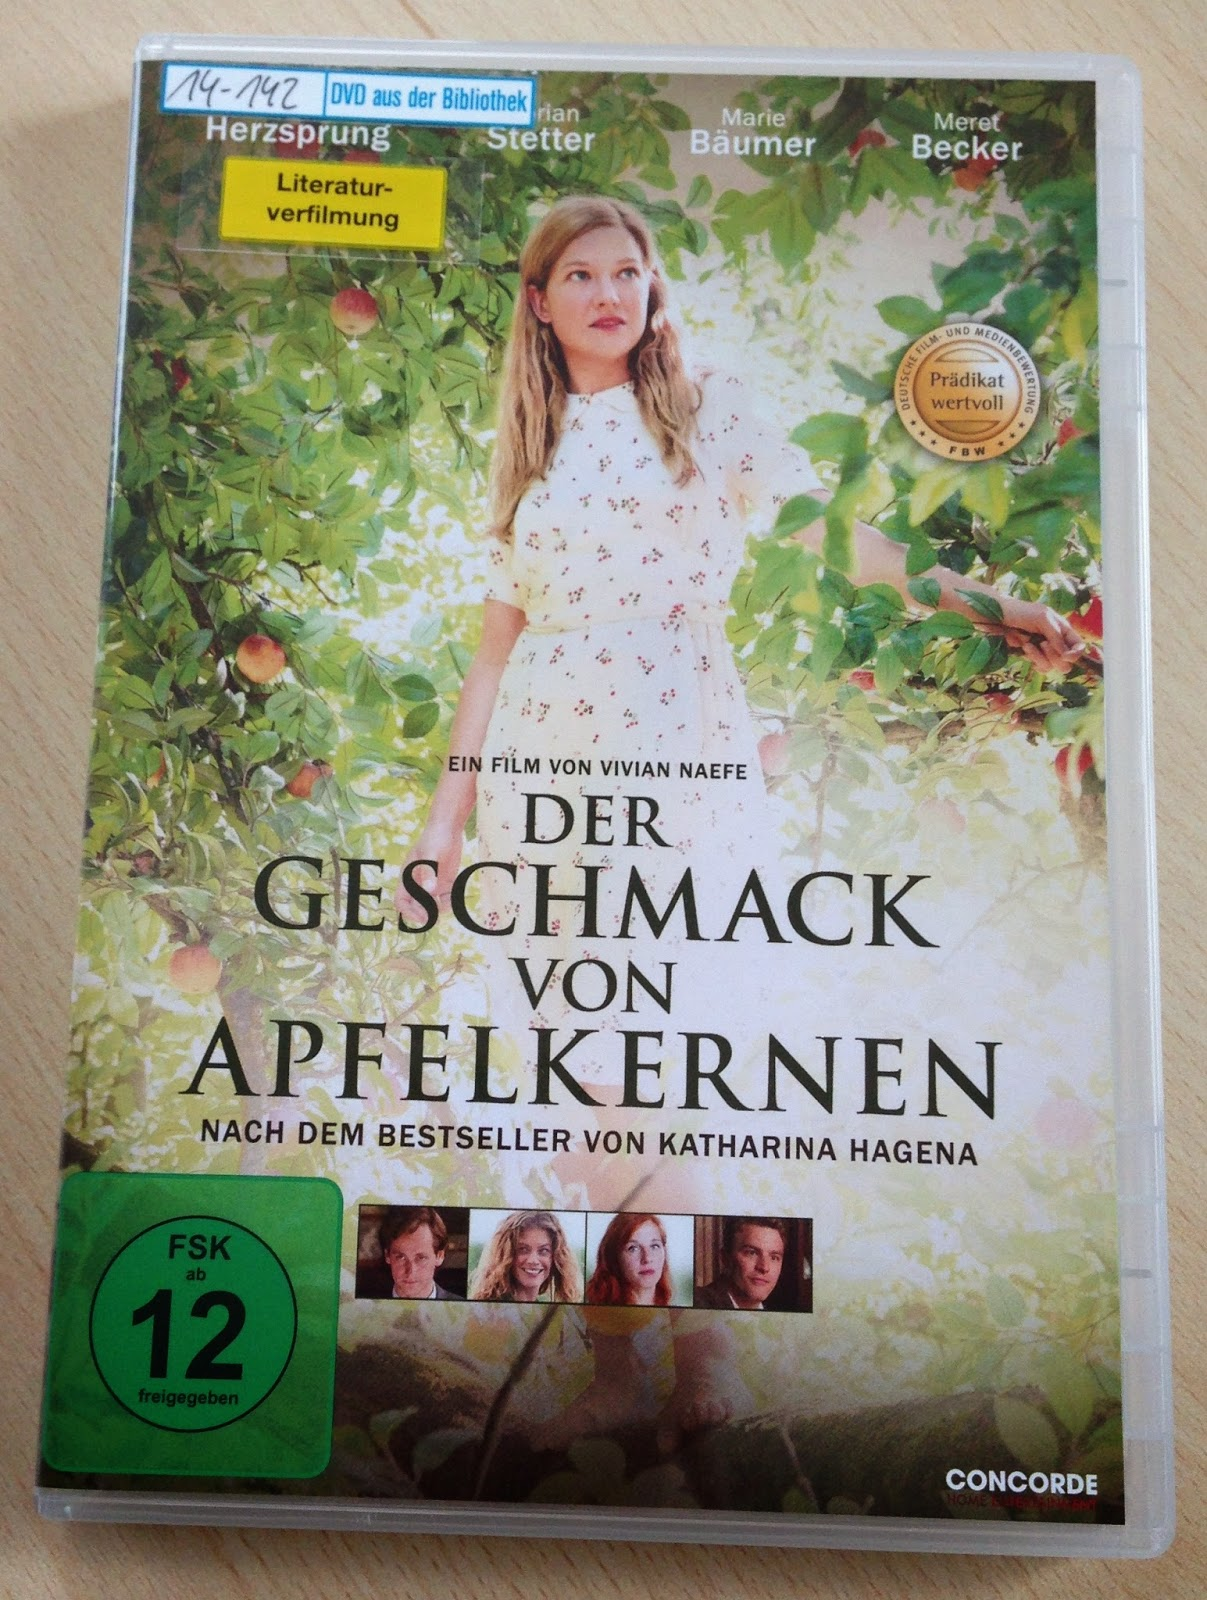 Apfelkerne Film